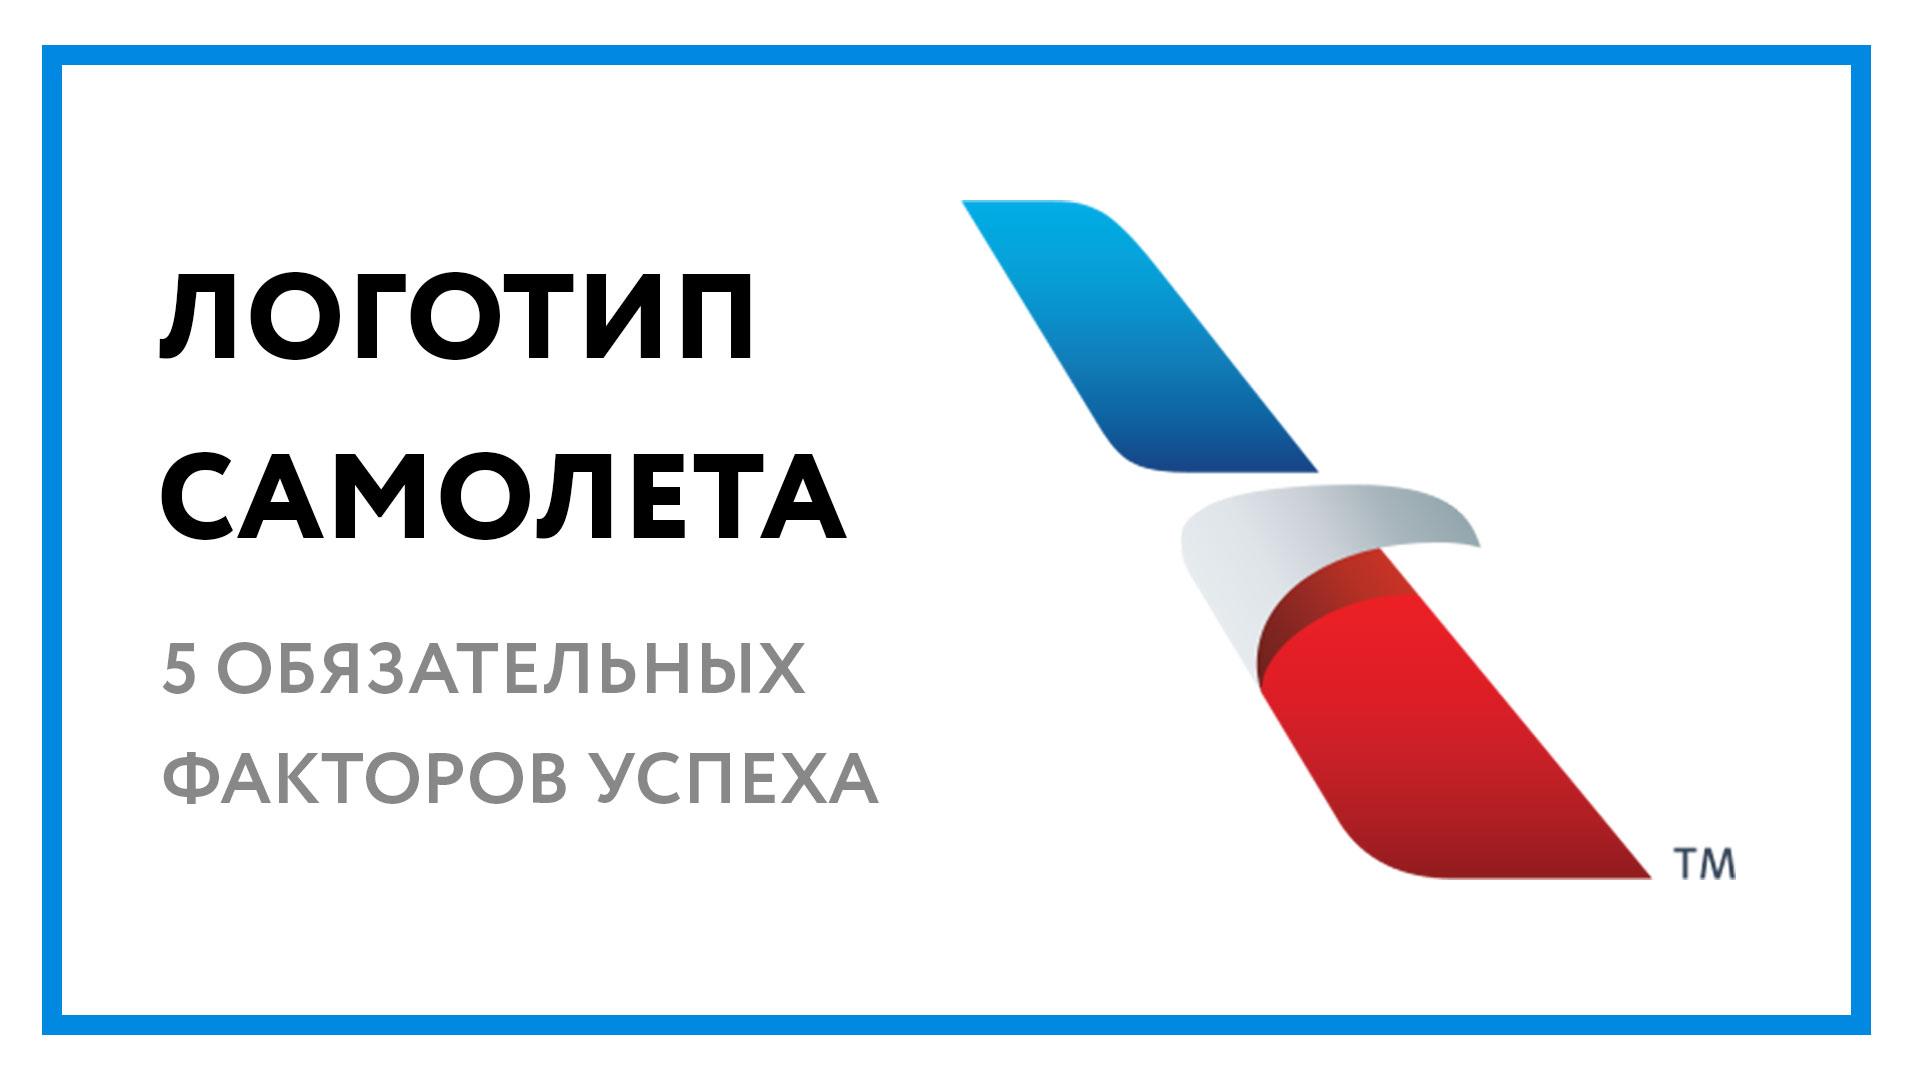 Логотип-самолета.jpg